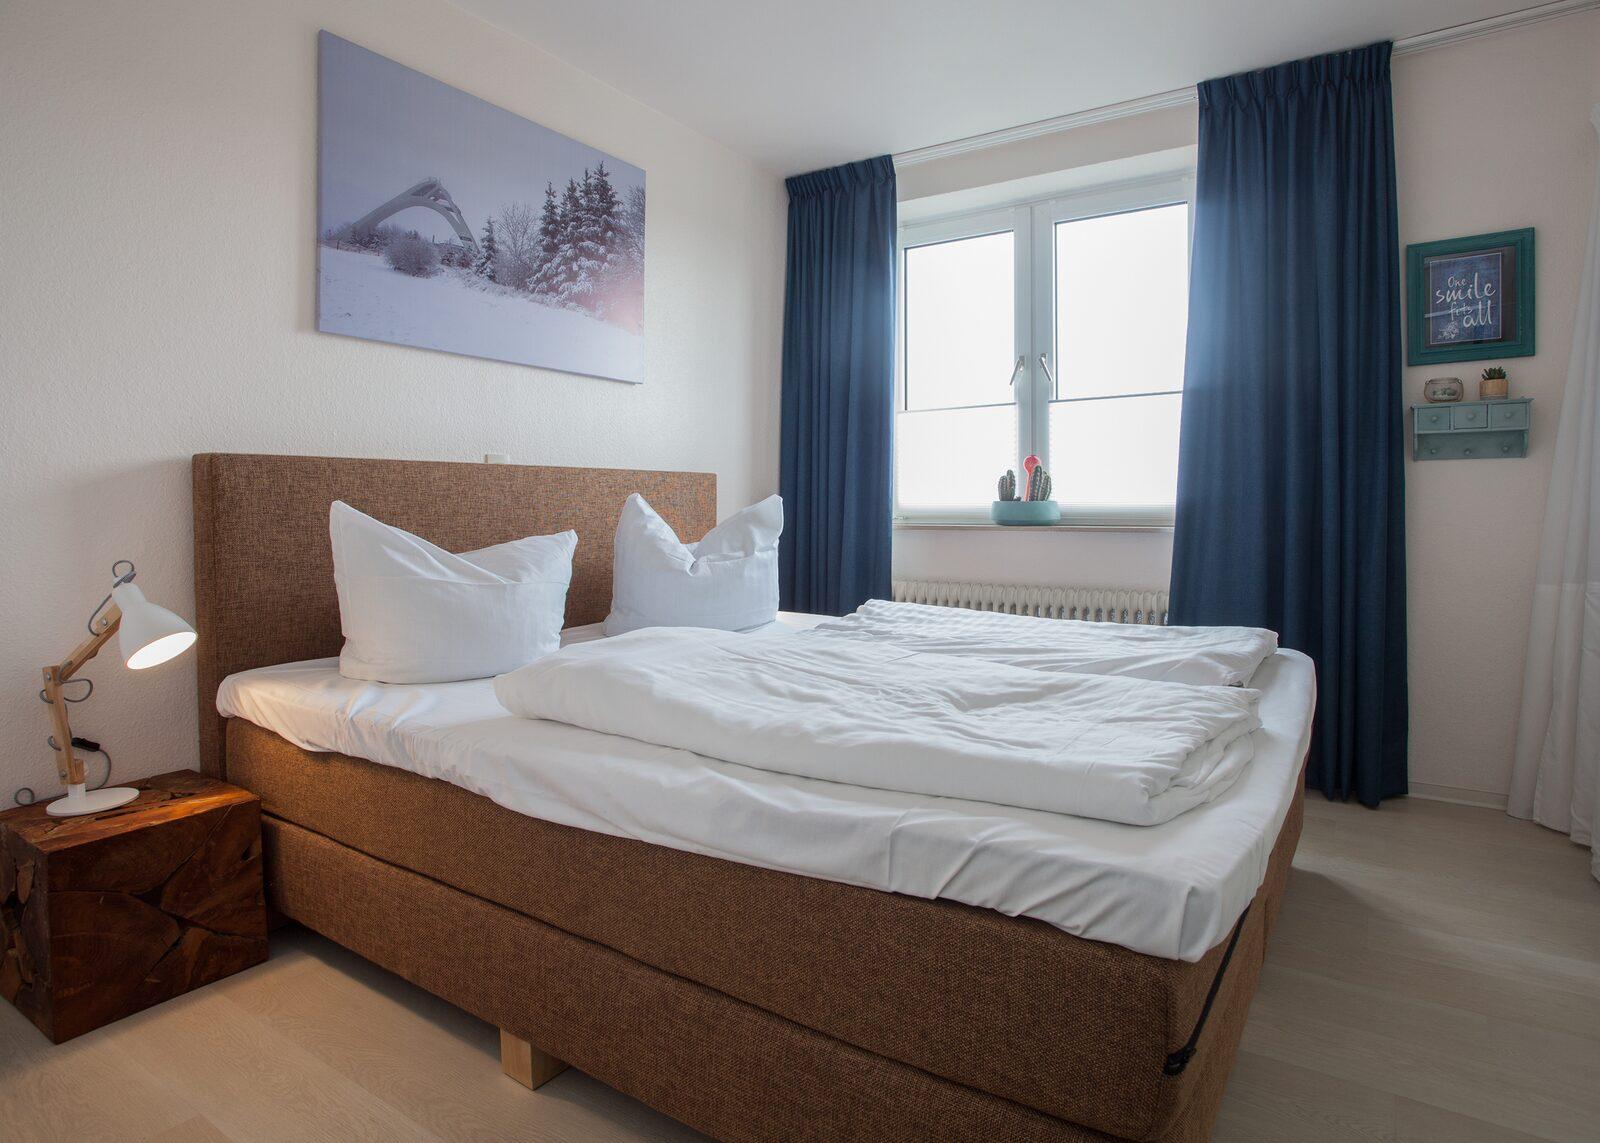 Appartement - Weltringpark 2-D | Winterberg